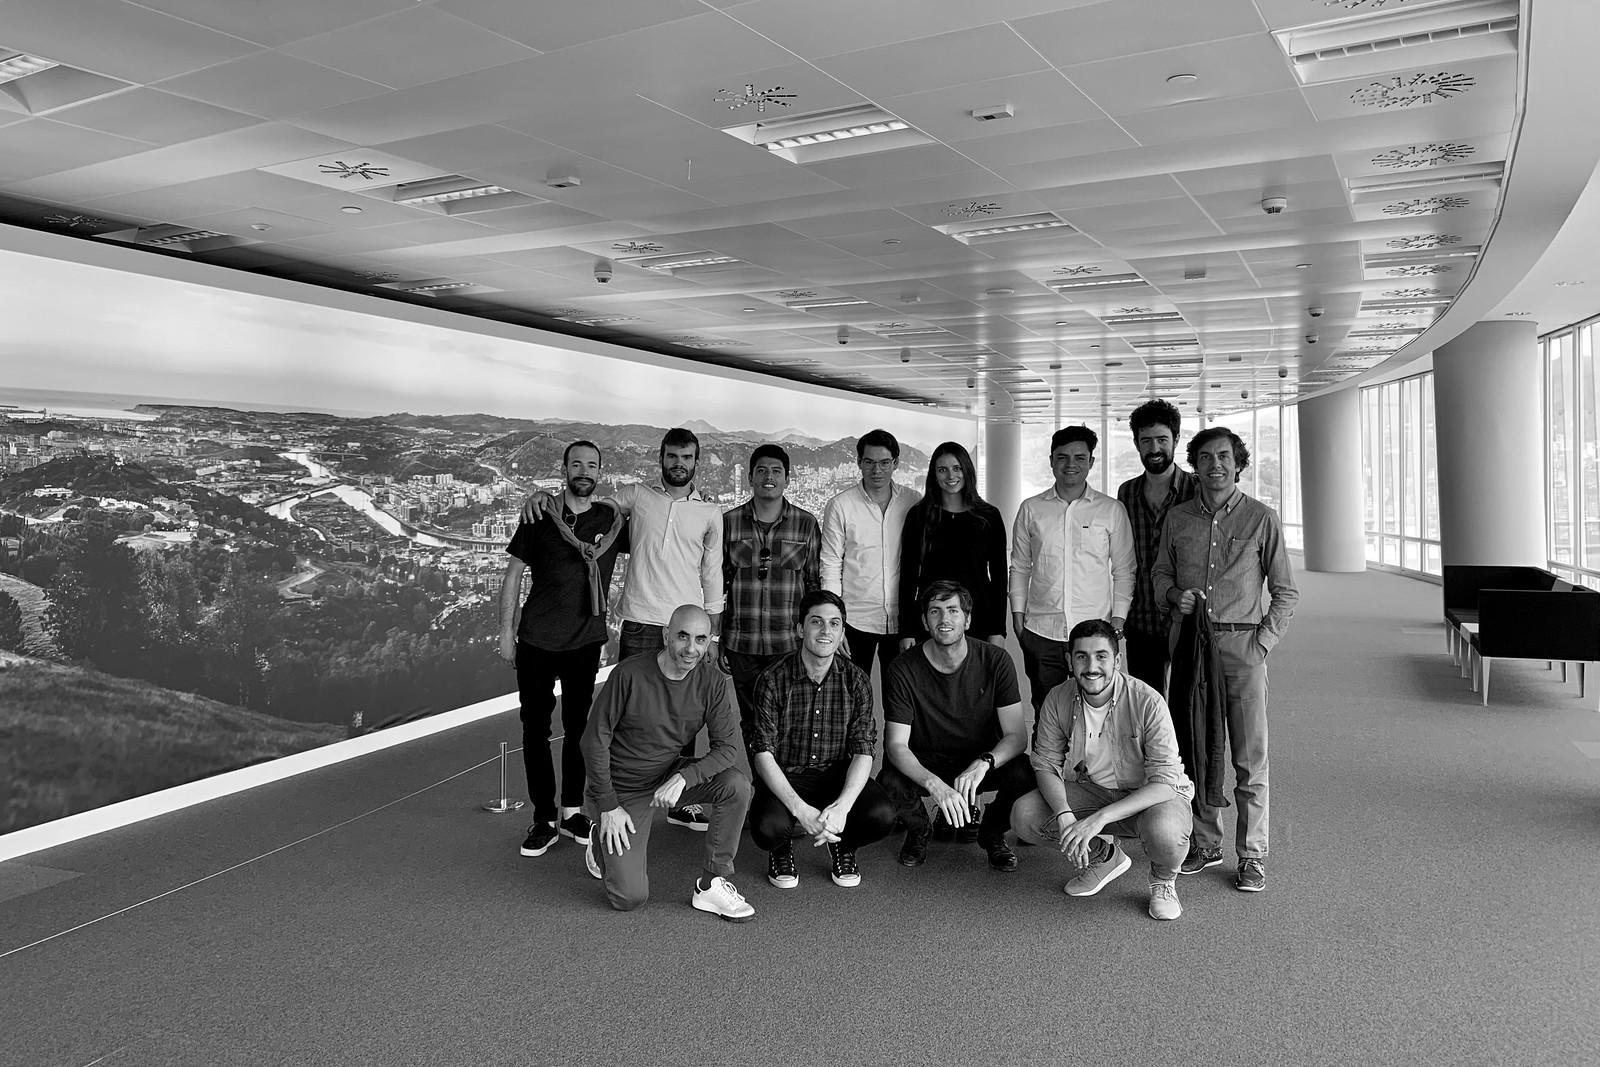 Workshop en Bilbao con Nader Tehrani. MtDA. 2019-20